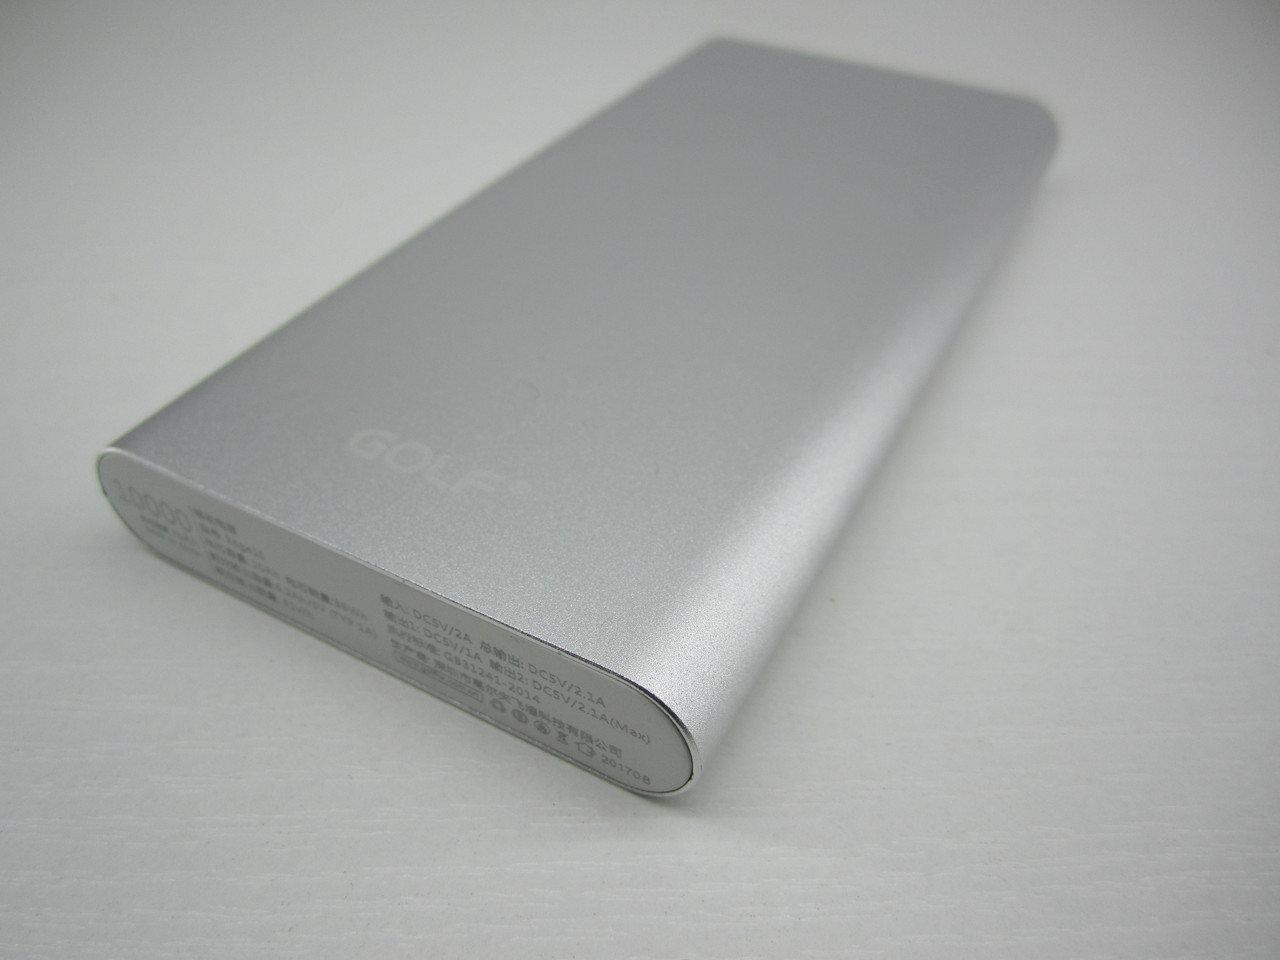 Портативная батарея GOLF Power bank 10000 mah Edge 10 Li-pol Silver